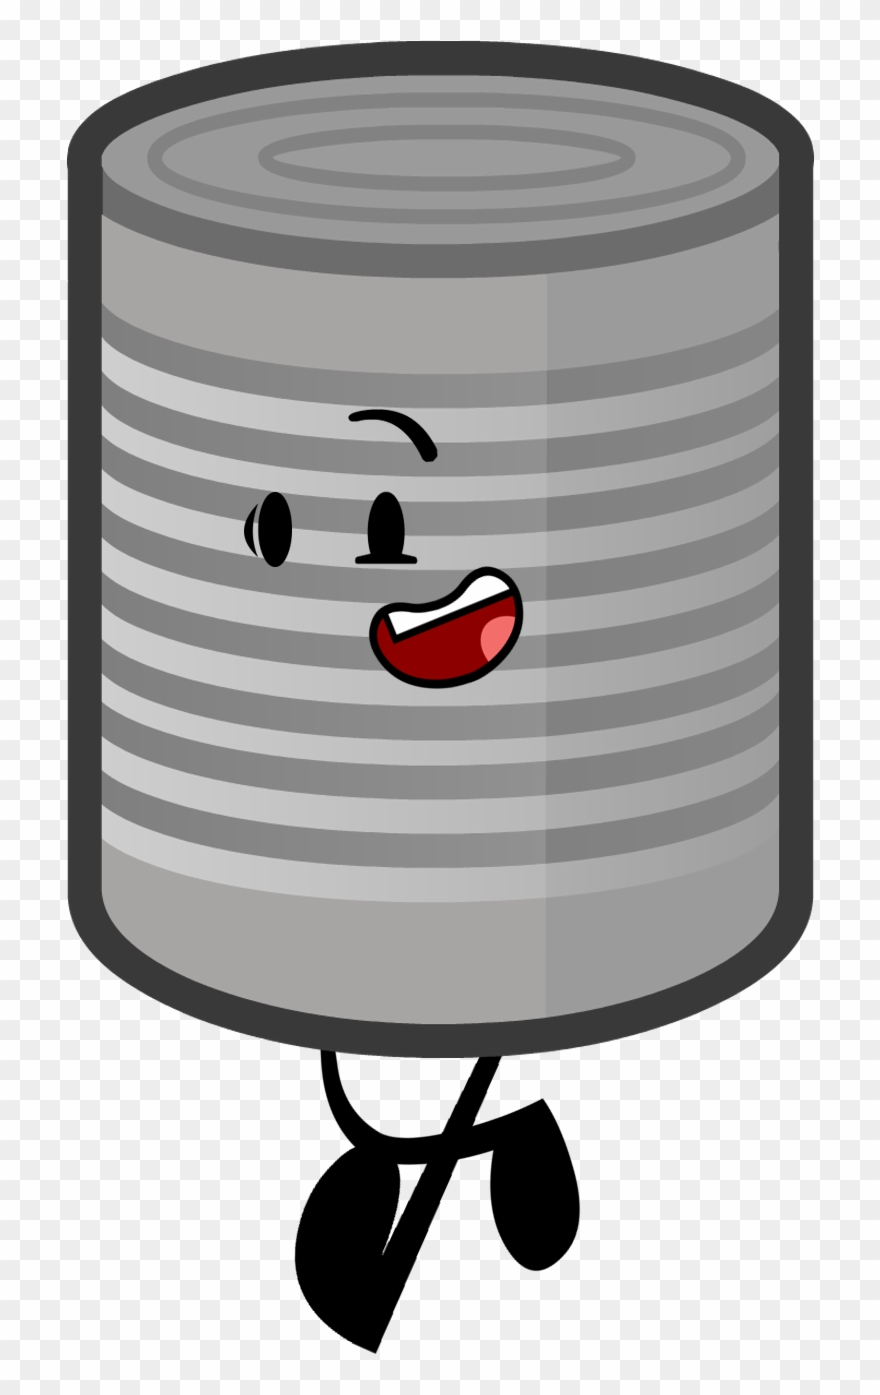 Soda Can Vector Clipart Design Illustration Stock Vector - Illustration of  design, sodacan: 41570721